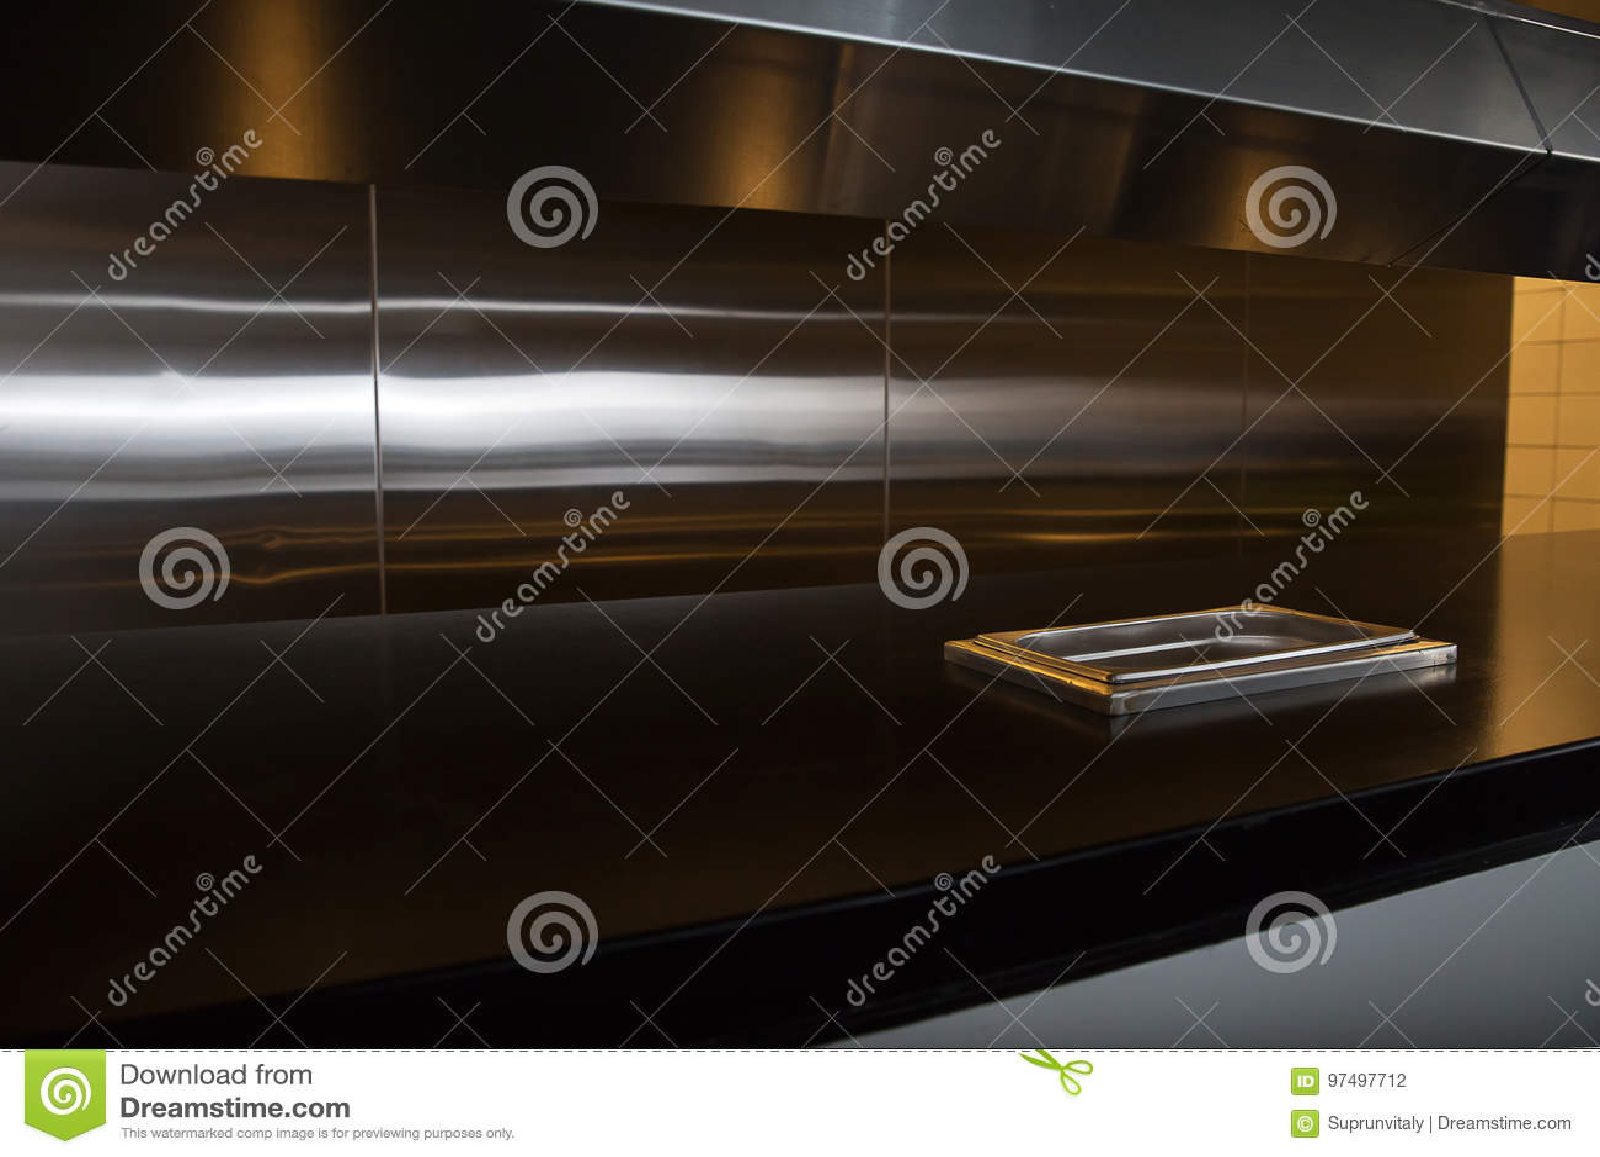 Cucina professionale, contatore di vista in acciaio